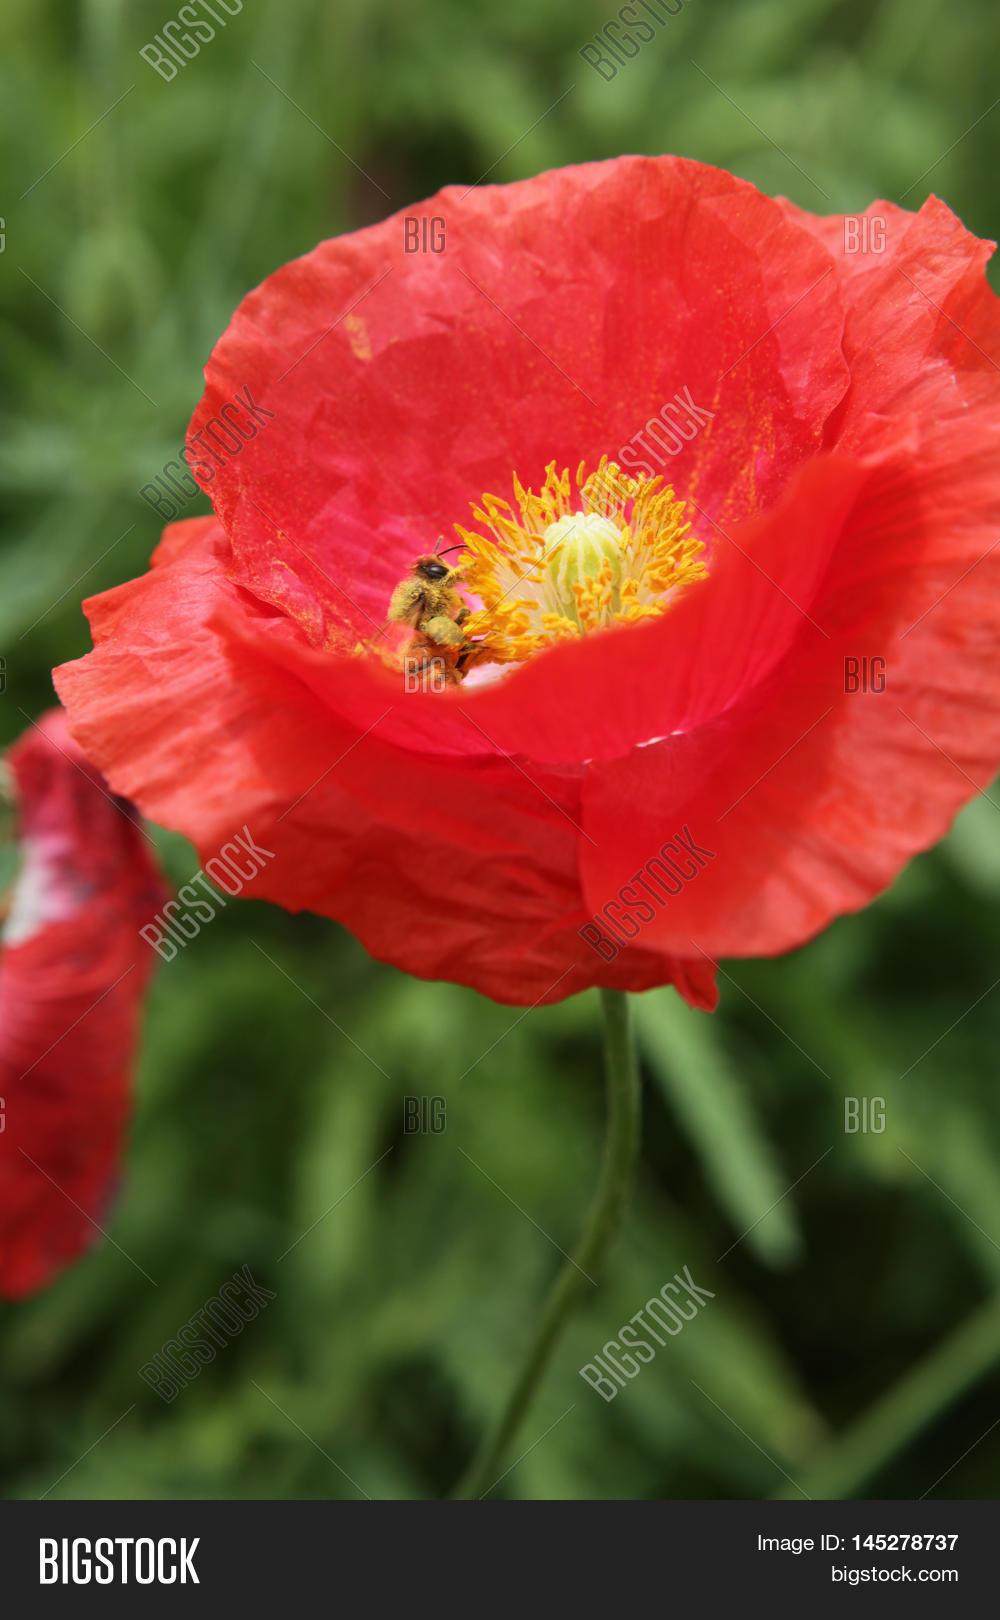 Beautiful Poppy Flower Image Photo Free Trial Bigstock